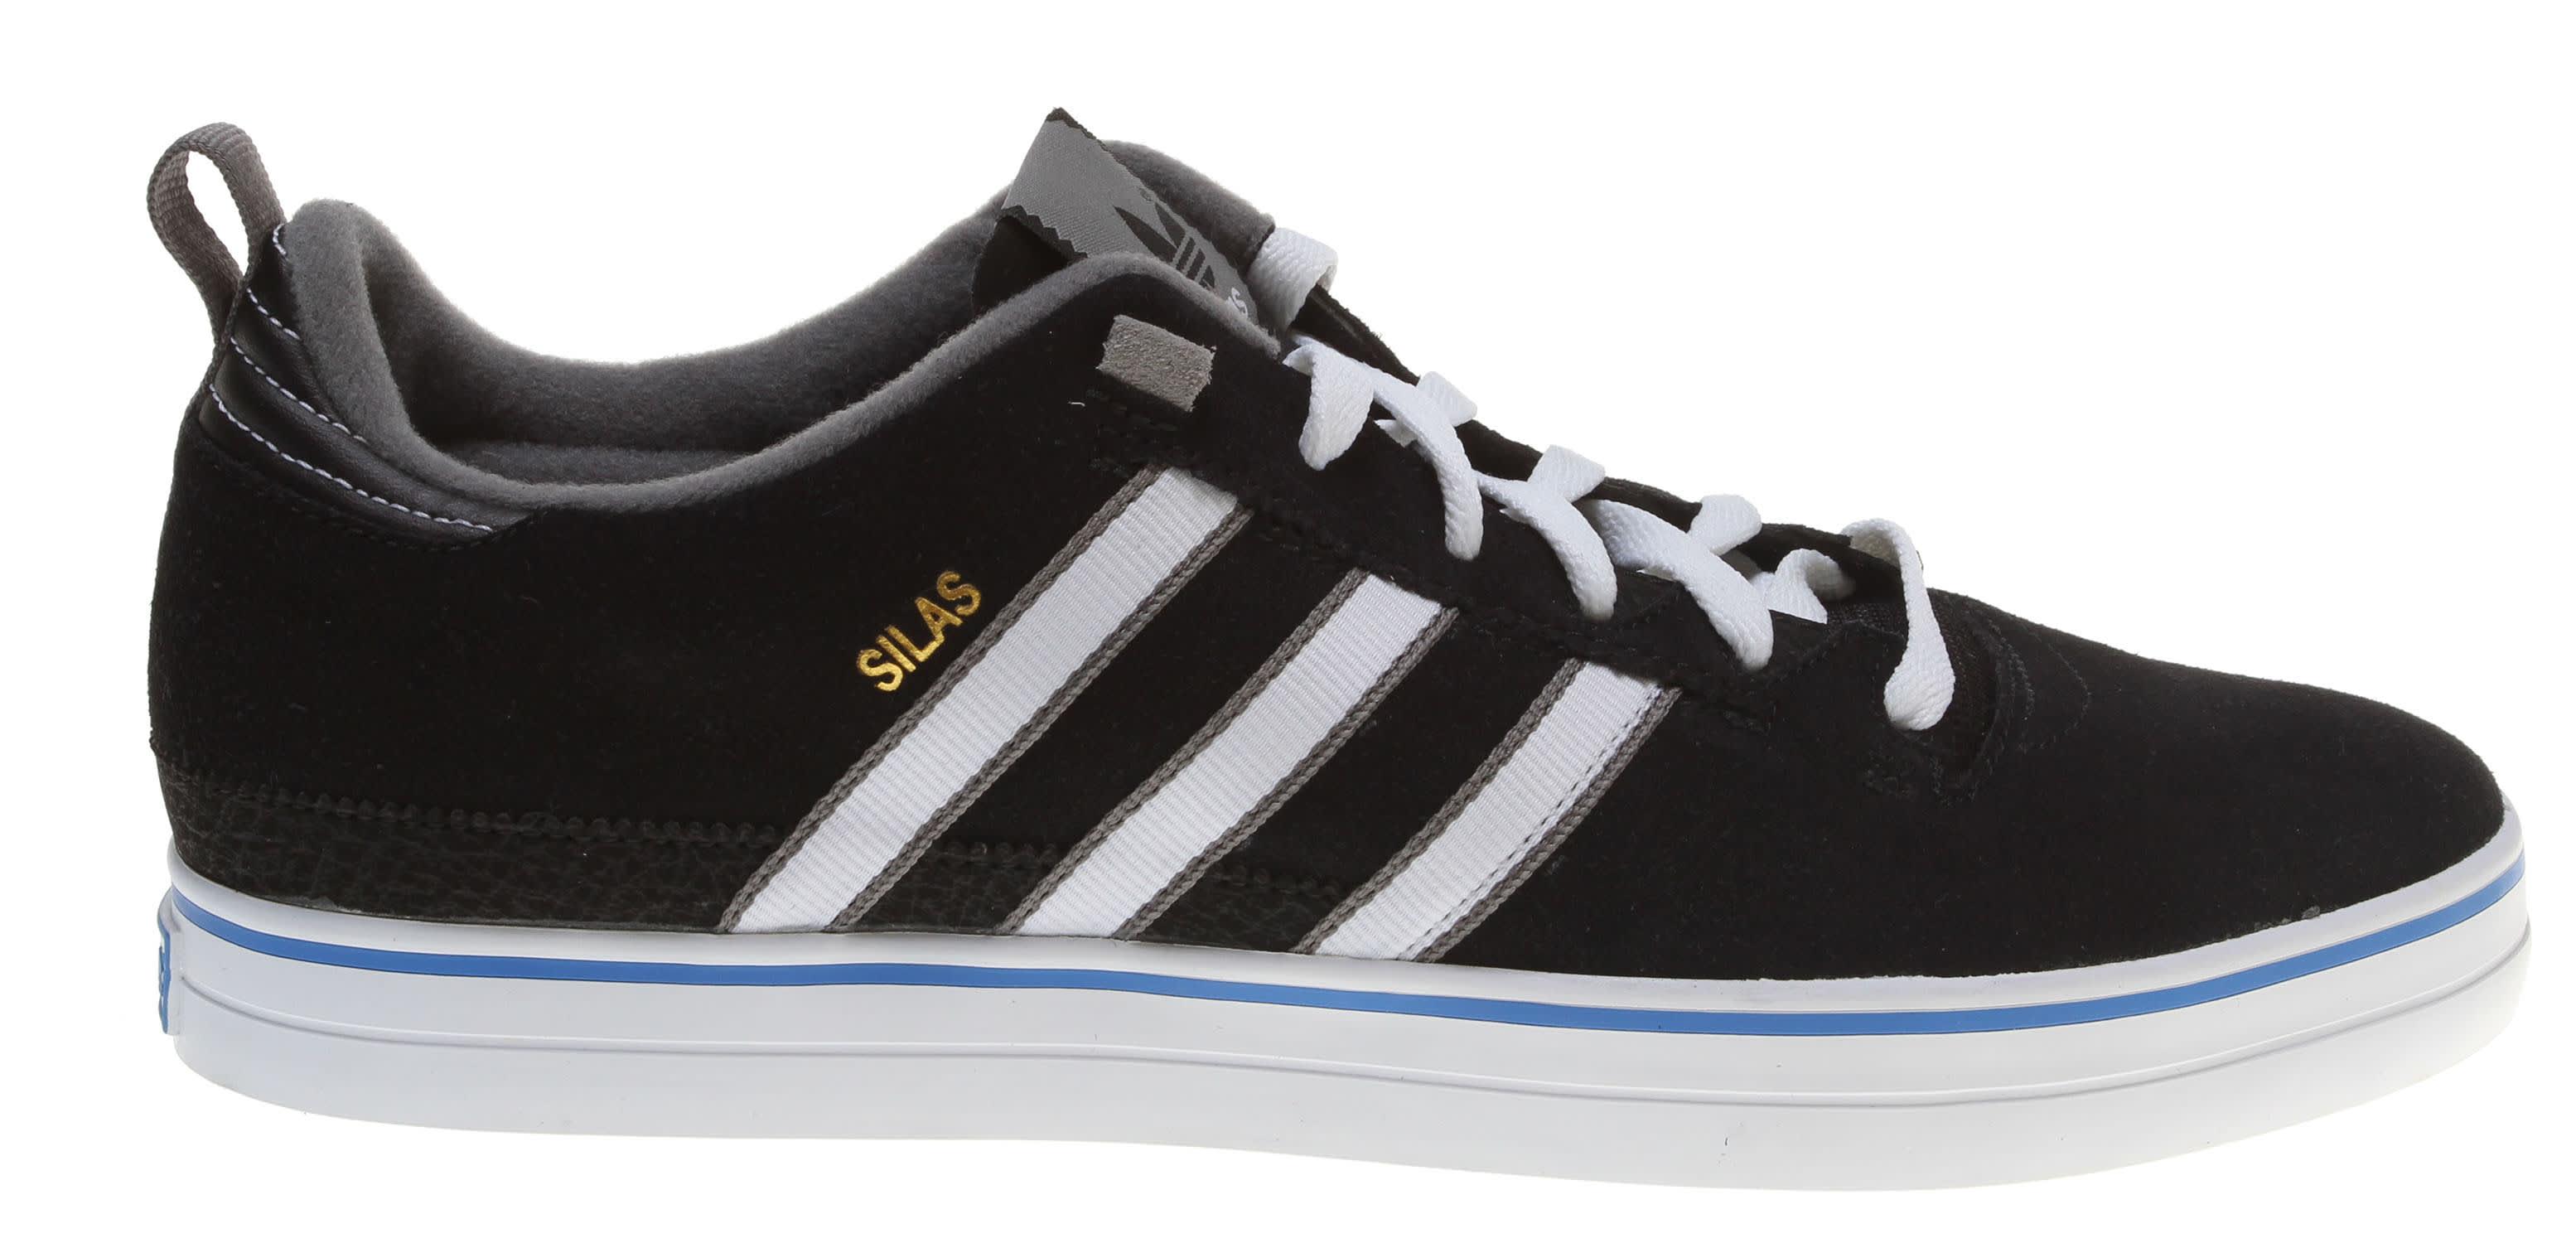 4b323d7d1c44 537de af20b  shop adidas silas pro ii skate shoes thumbnail 1 b4d34 da6be